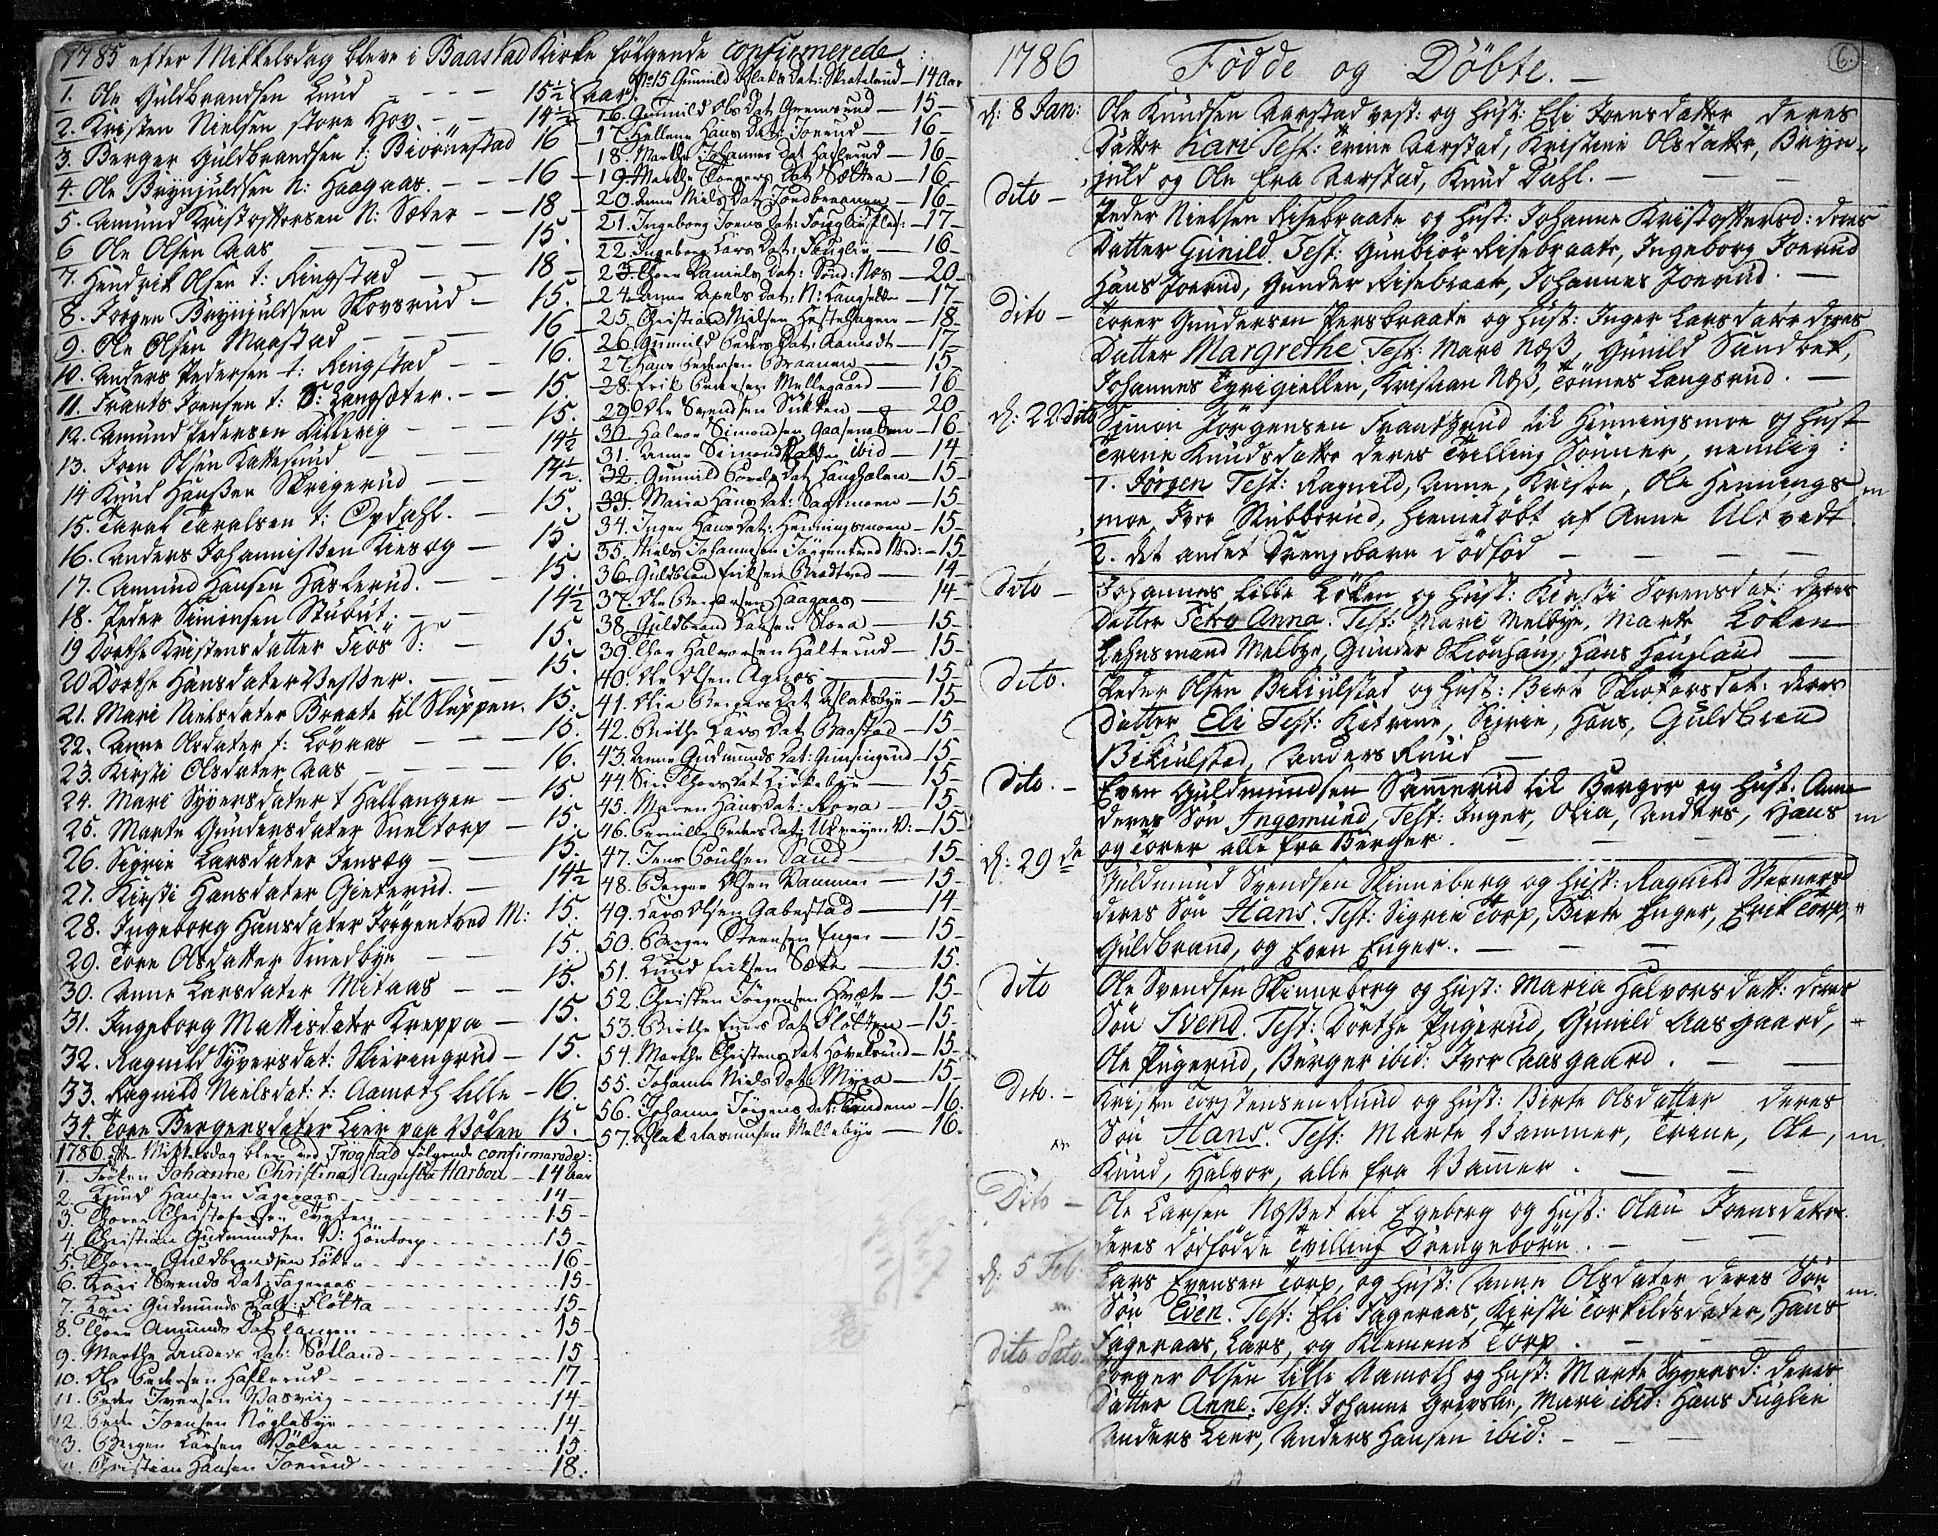 SAO, Trøgstad prestekontor Kirkebøker, F/Fa/L0005: Parish register (official) no. I 5, 1784-1814, p. 6